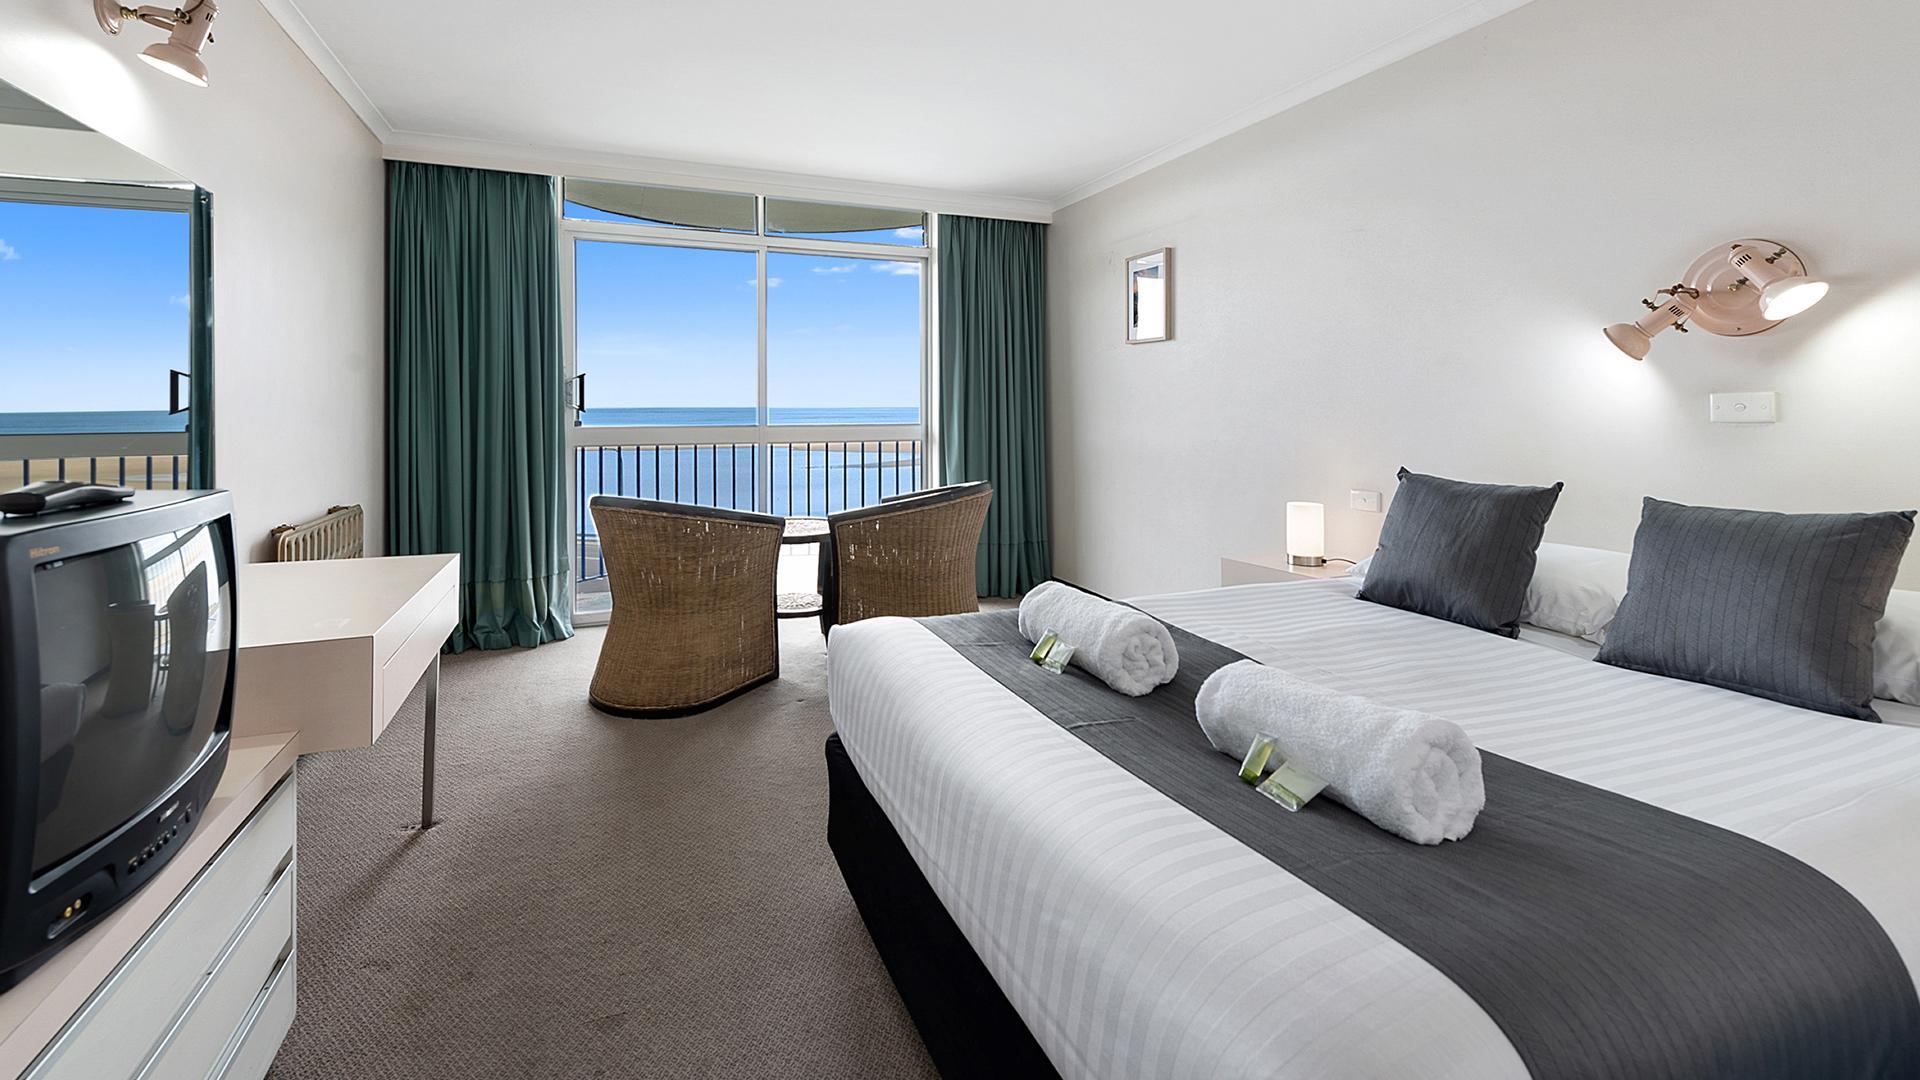 Ocean View Queen image 1 at Scamander Beach Resort by Break O'Day Council, Tasmania, Australia